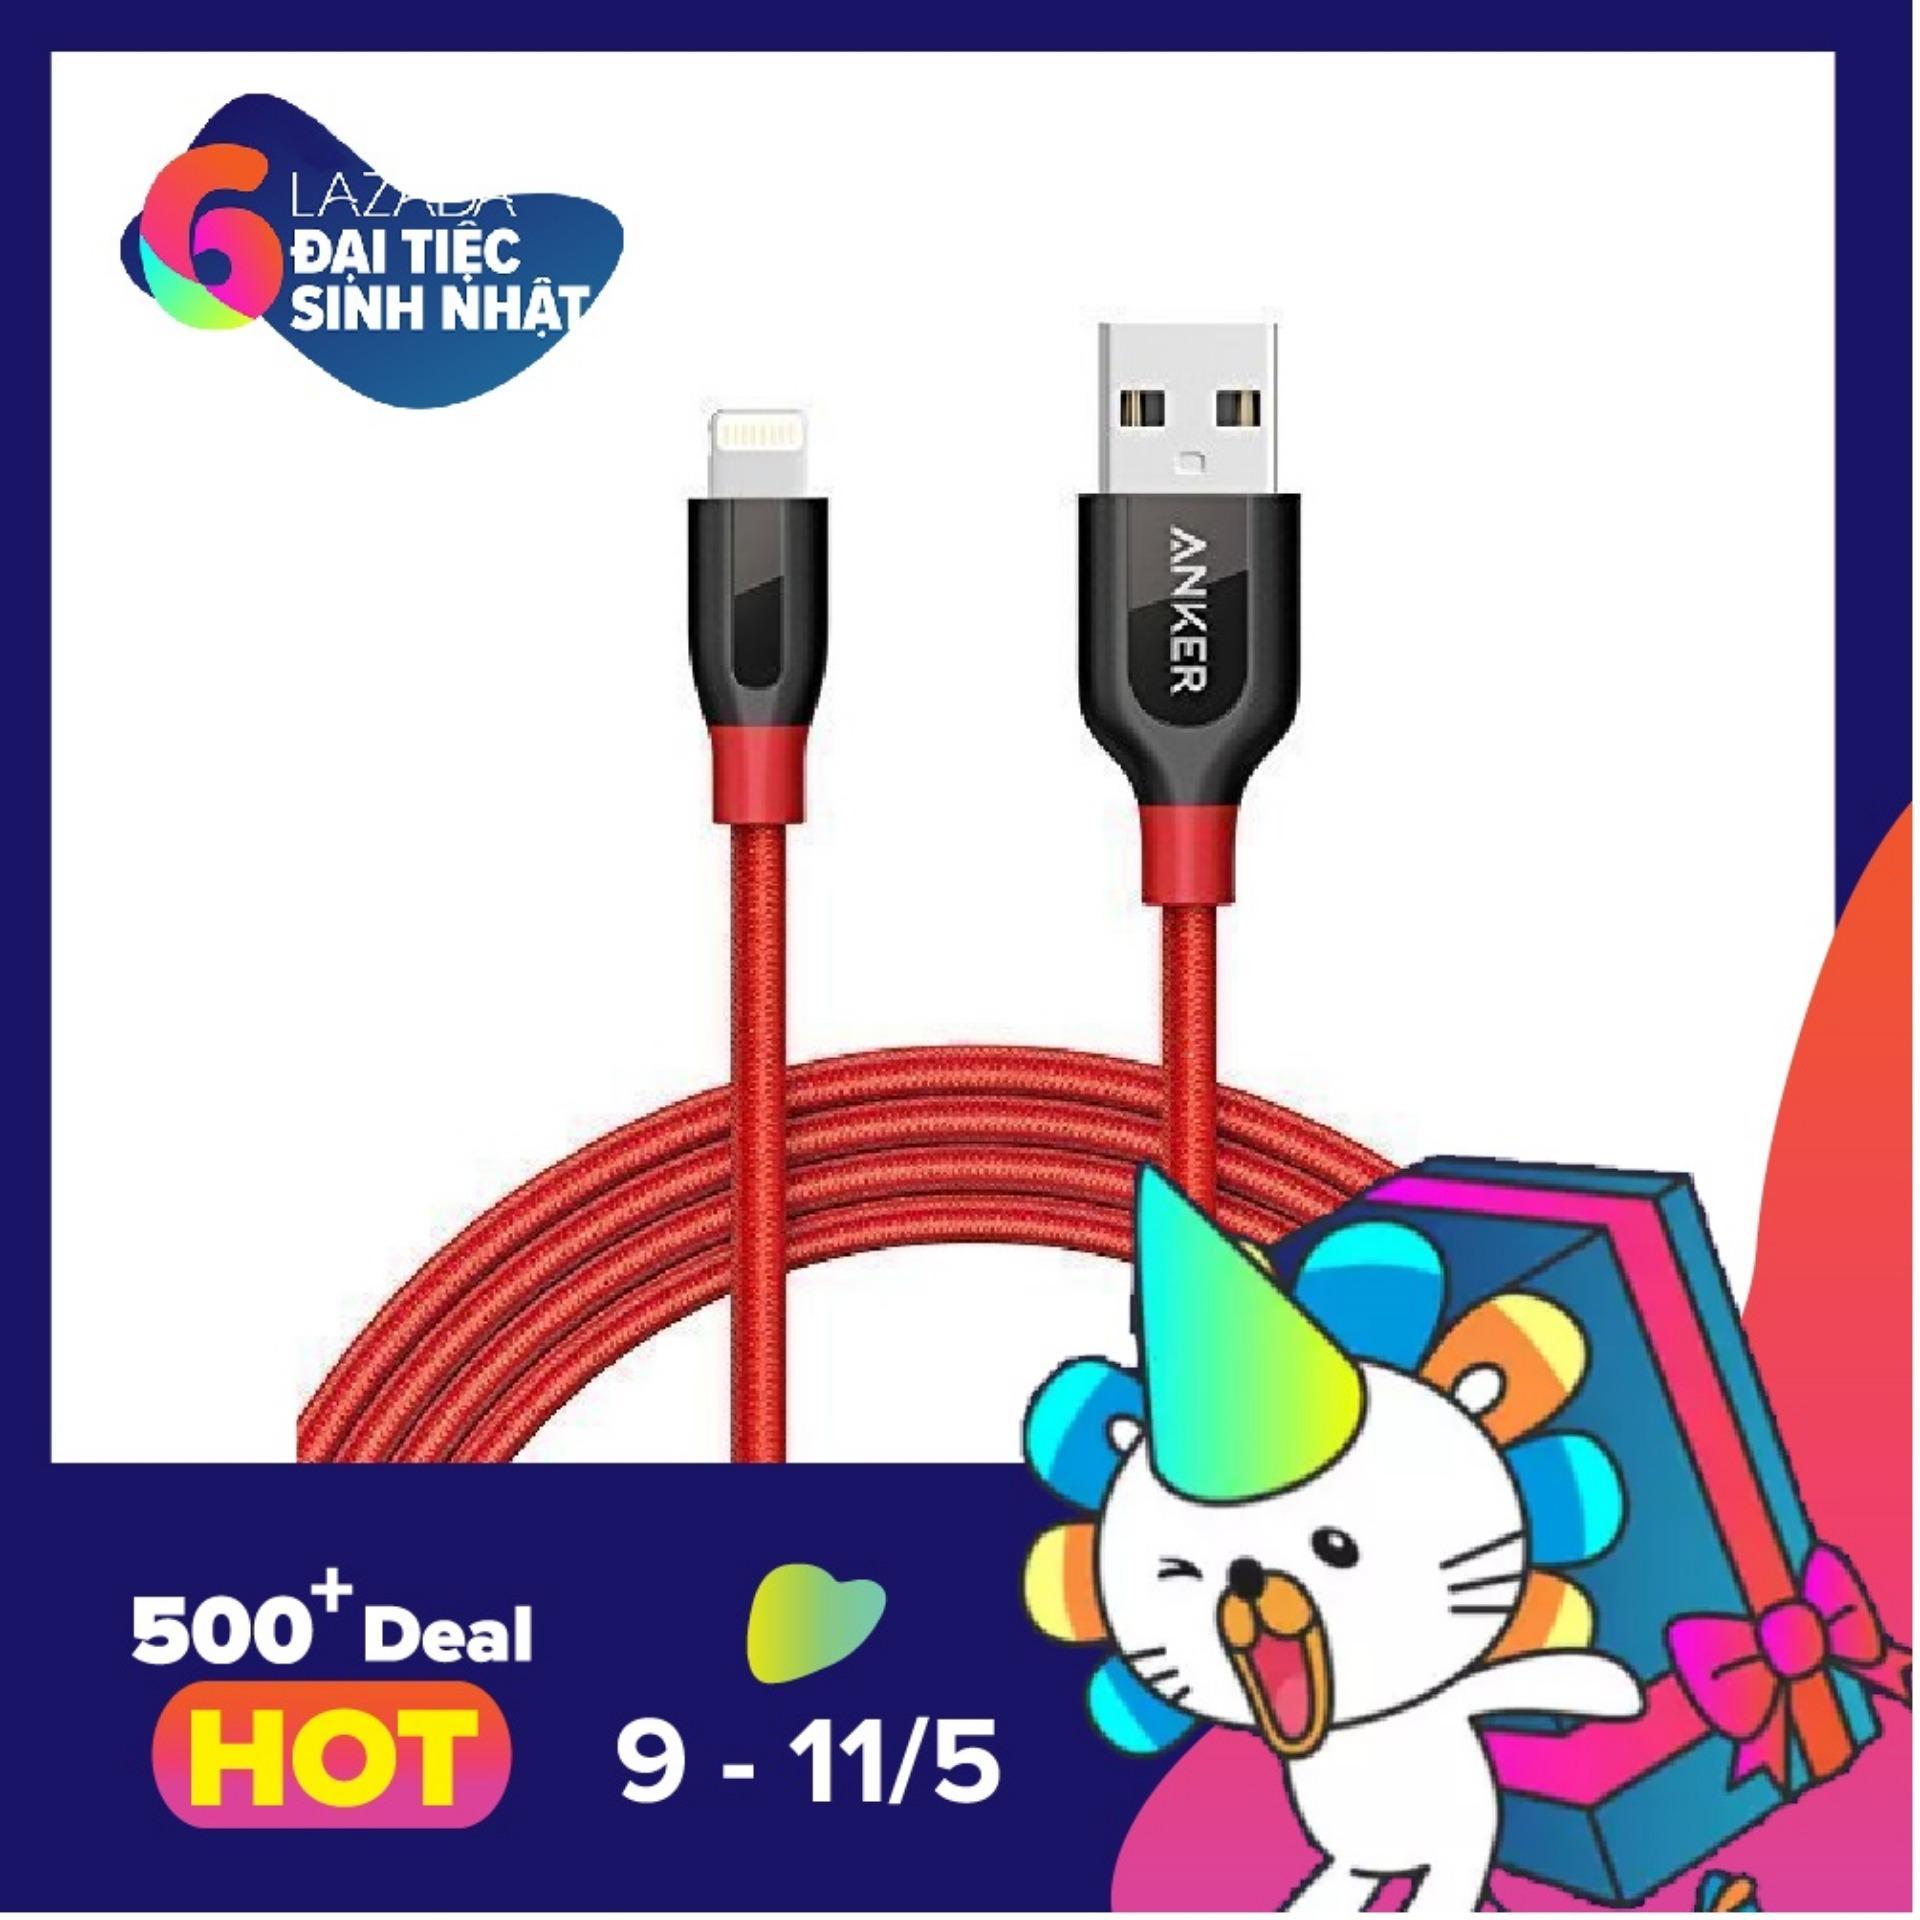 Mua Cap Sạc Sieu Bền Anker Powerline Lightning 9M Cho Iphone Ipod Ipad Co Bao Da Rẻ